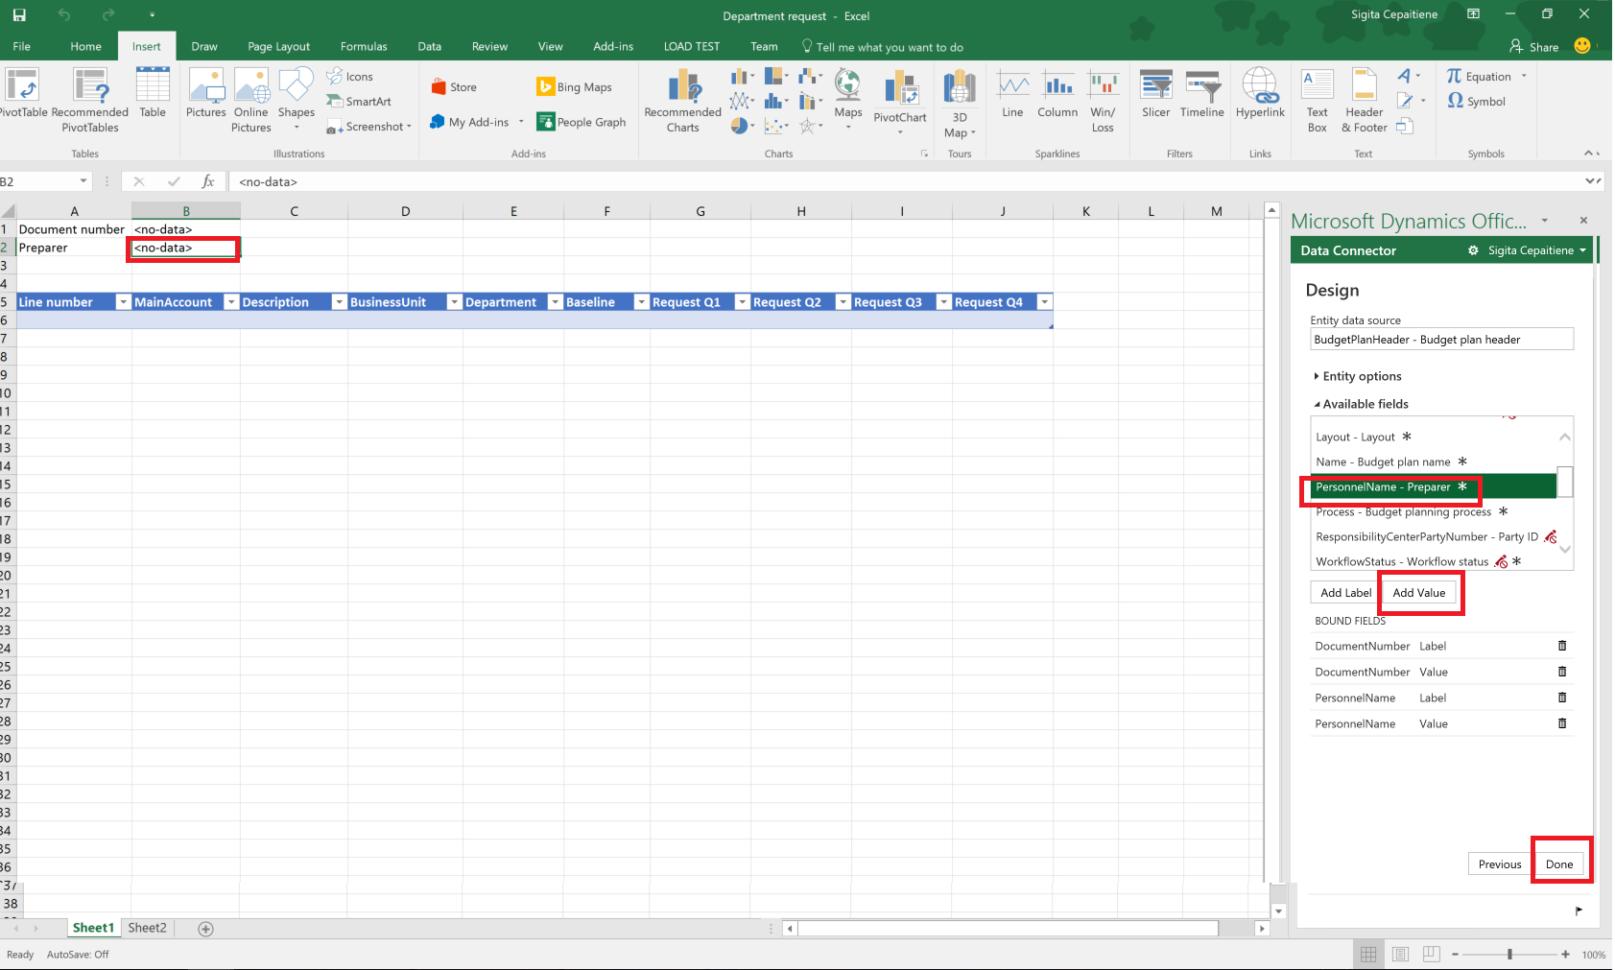 13 best Excel Spreadsheet Ideas images on Pinterest ... |Operations Spreadsheet